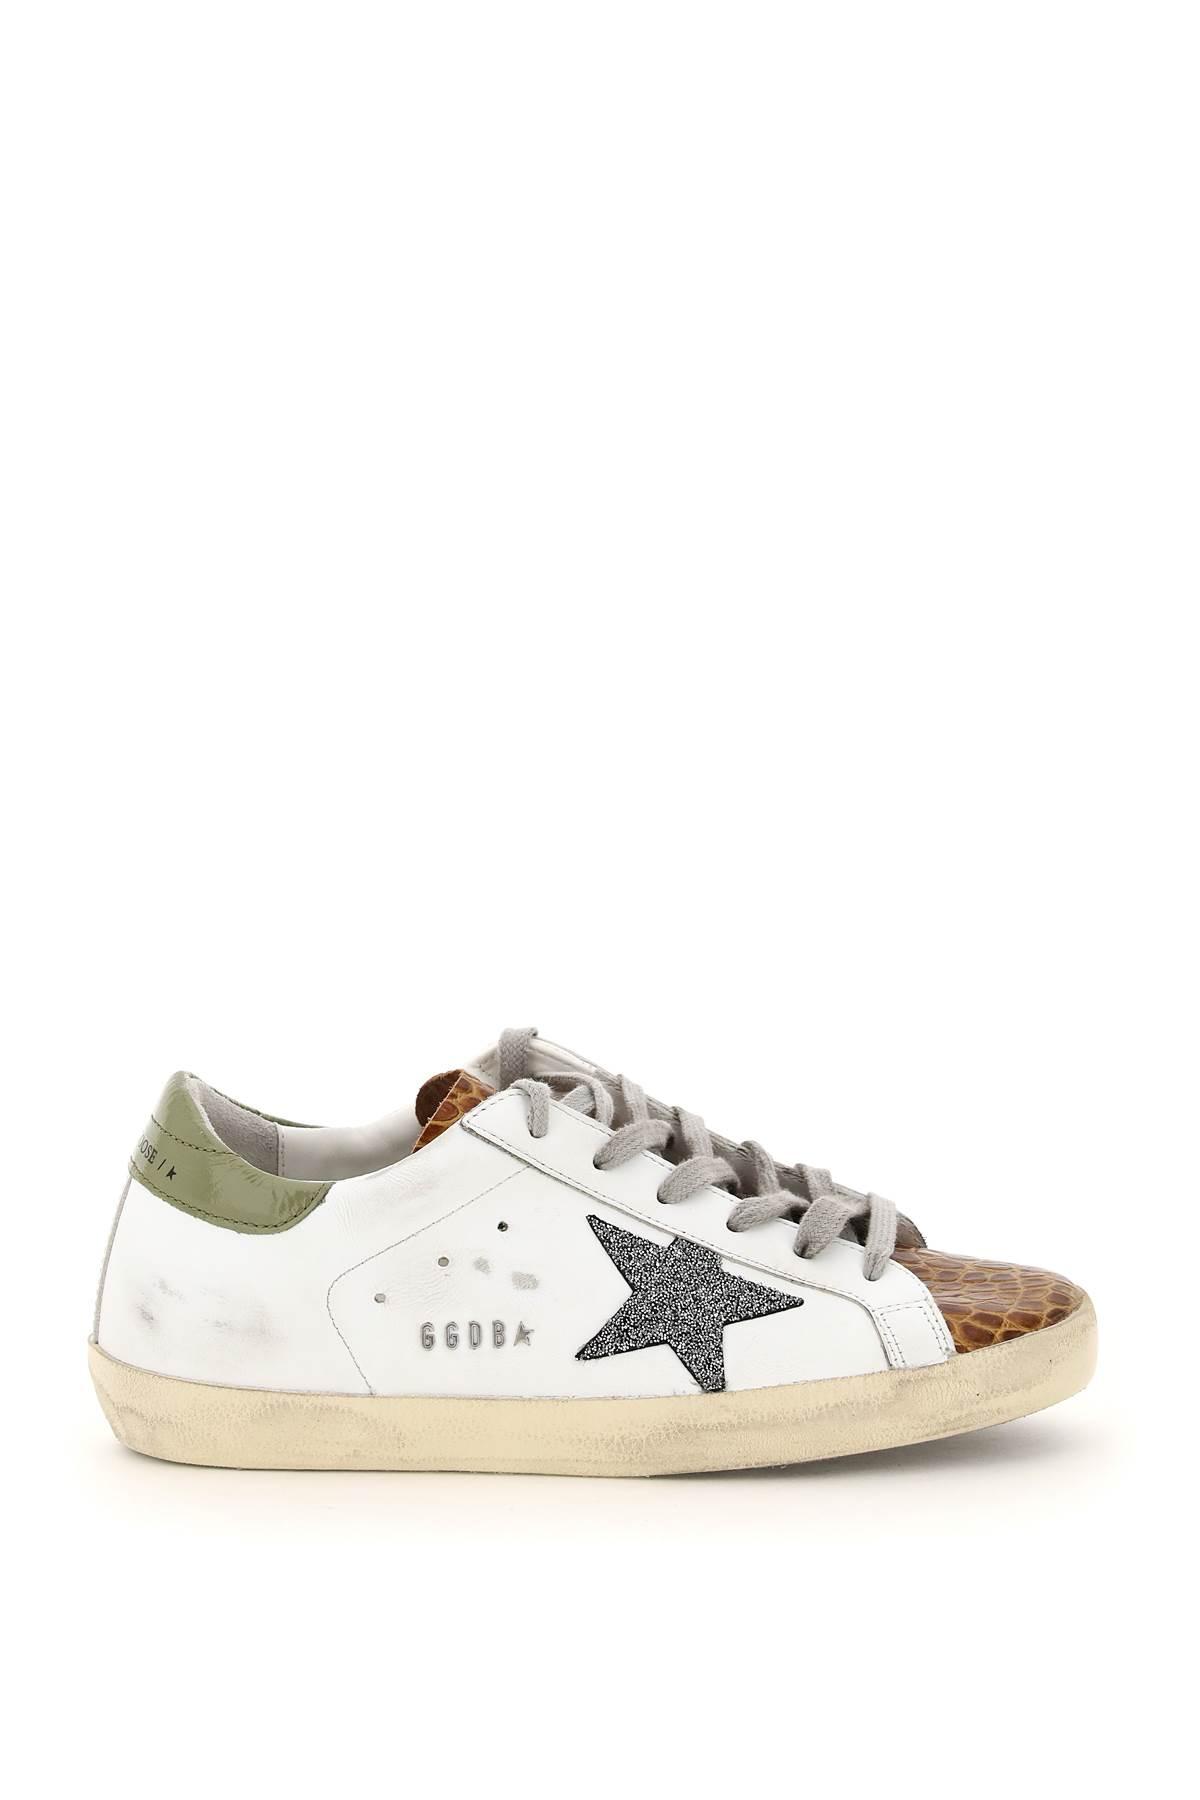 Golden Goose Super Star Sneakers With Swarovski